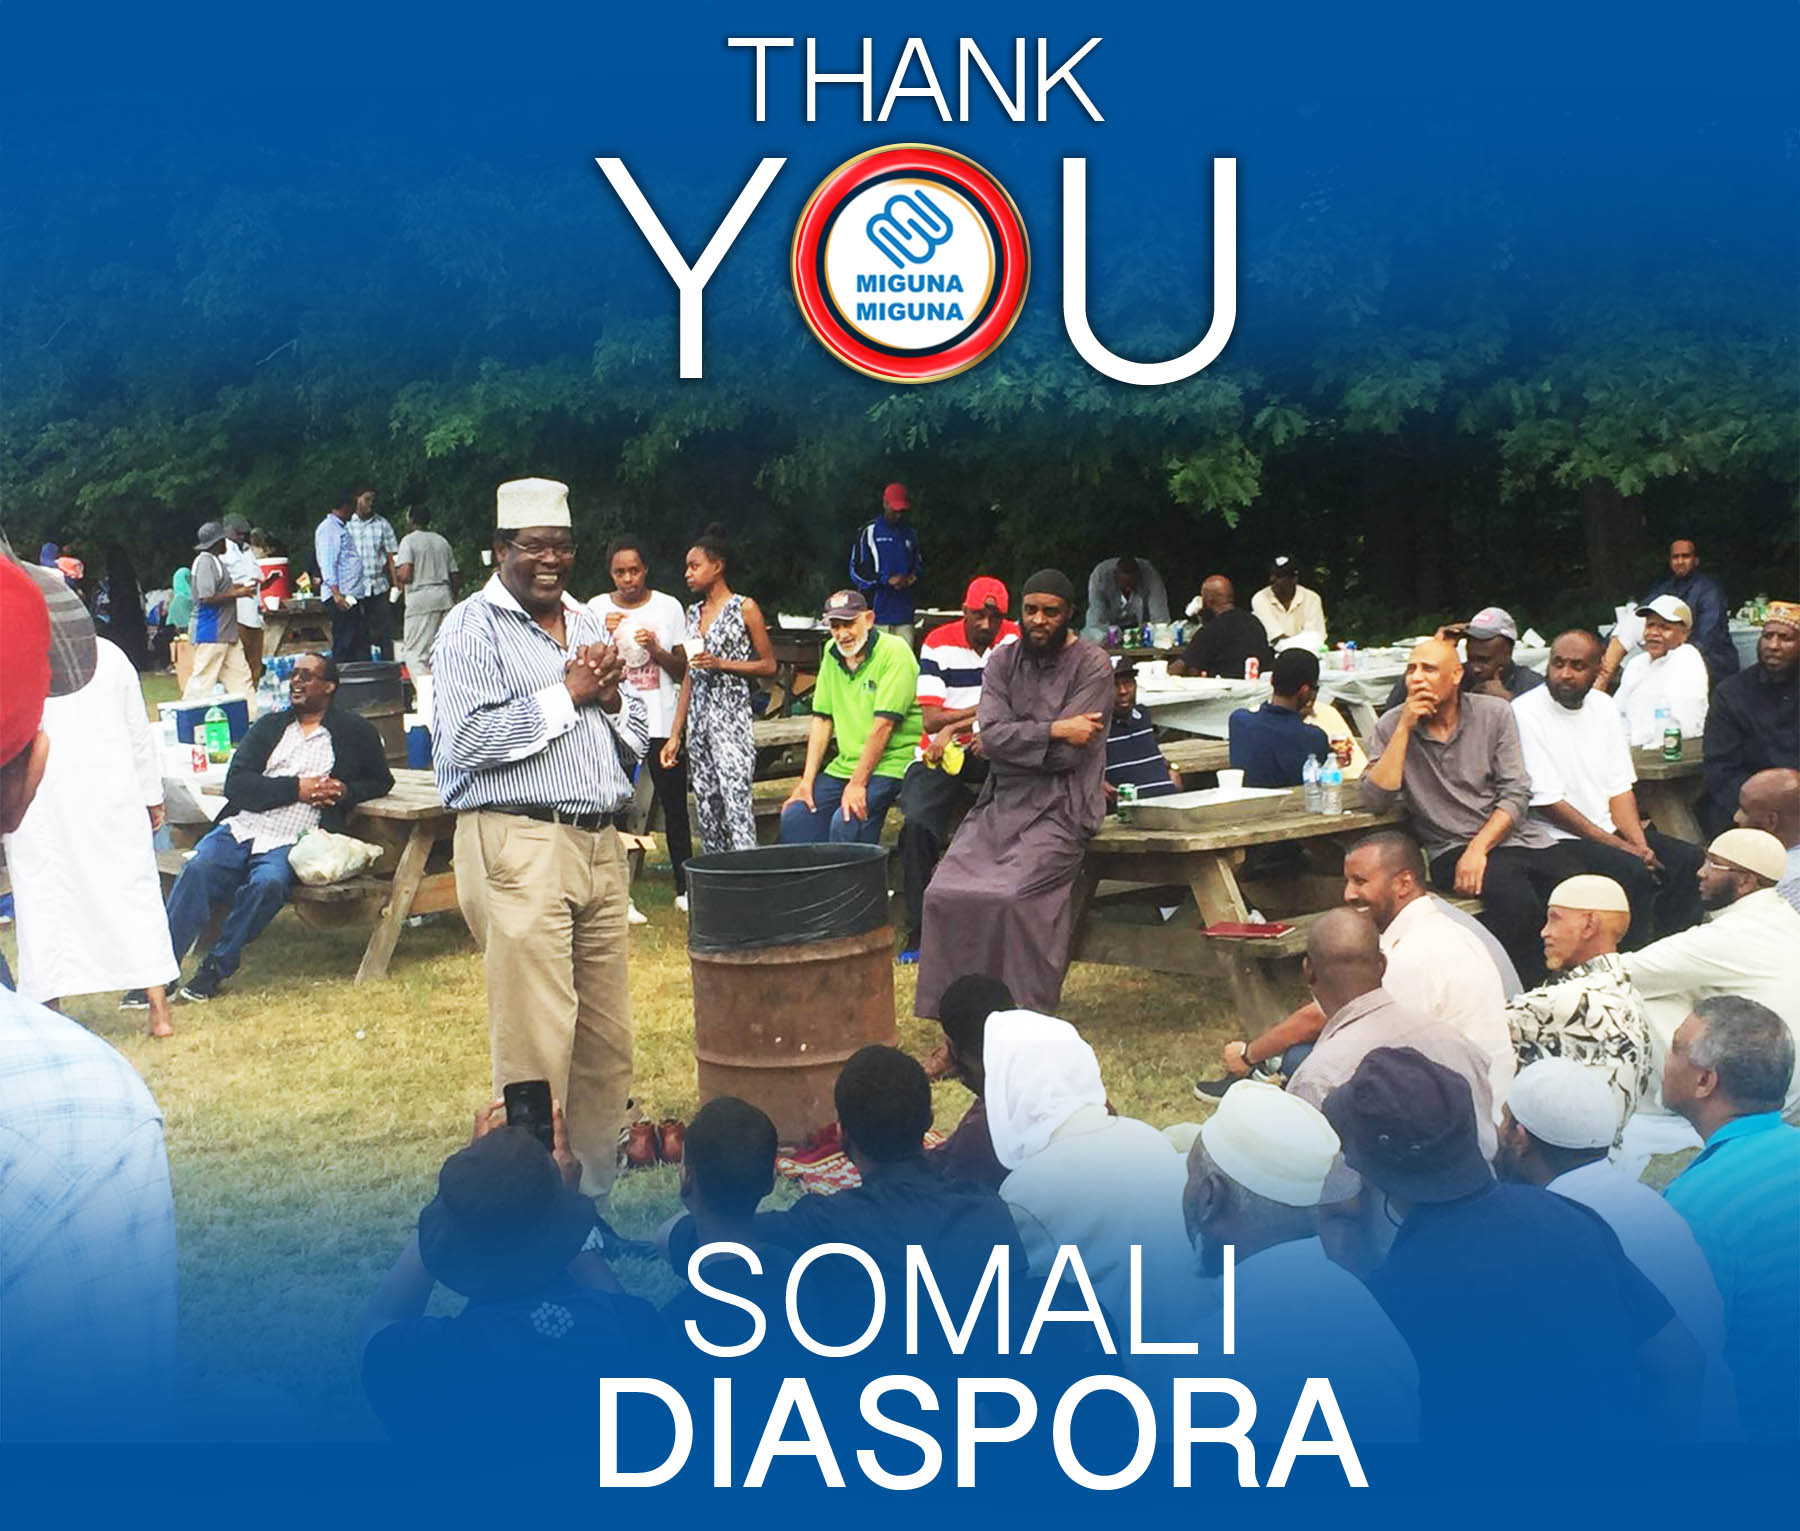 Somali diaspora.